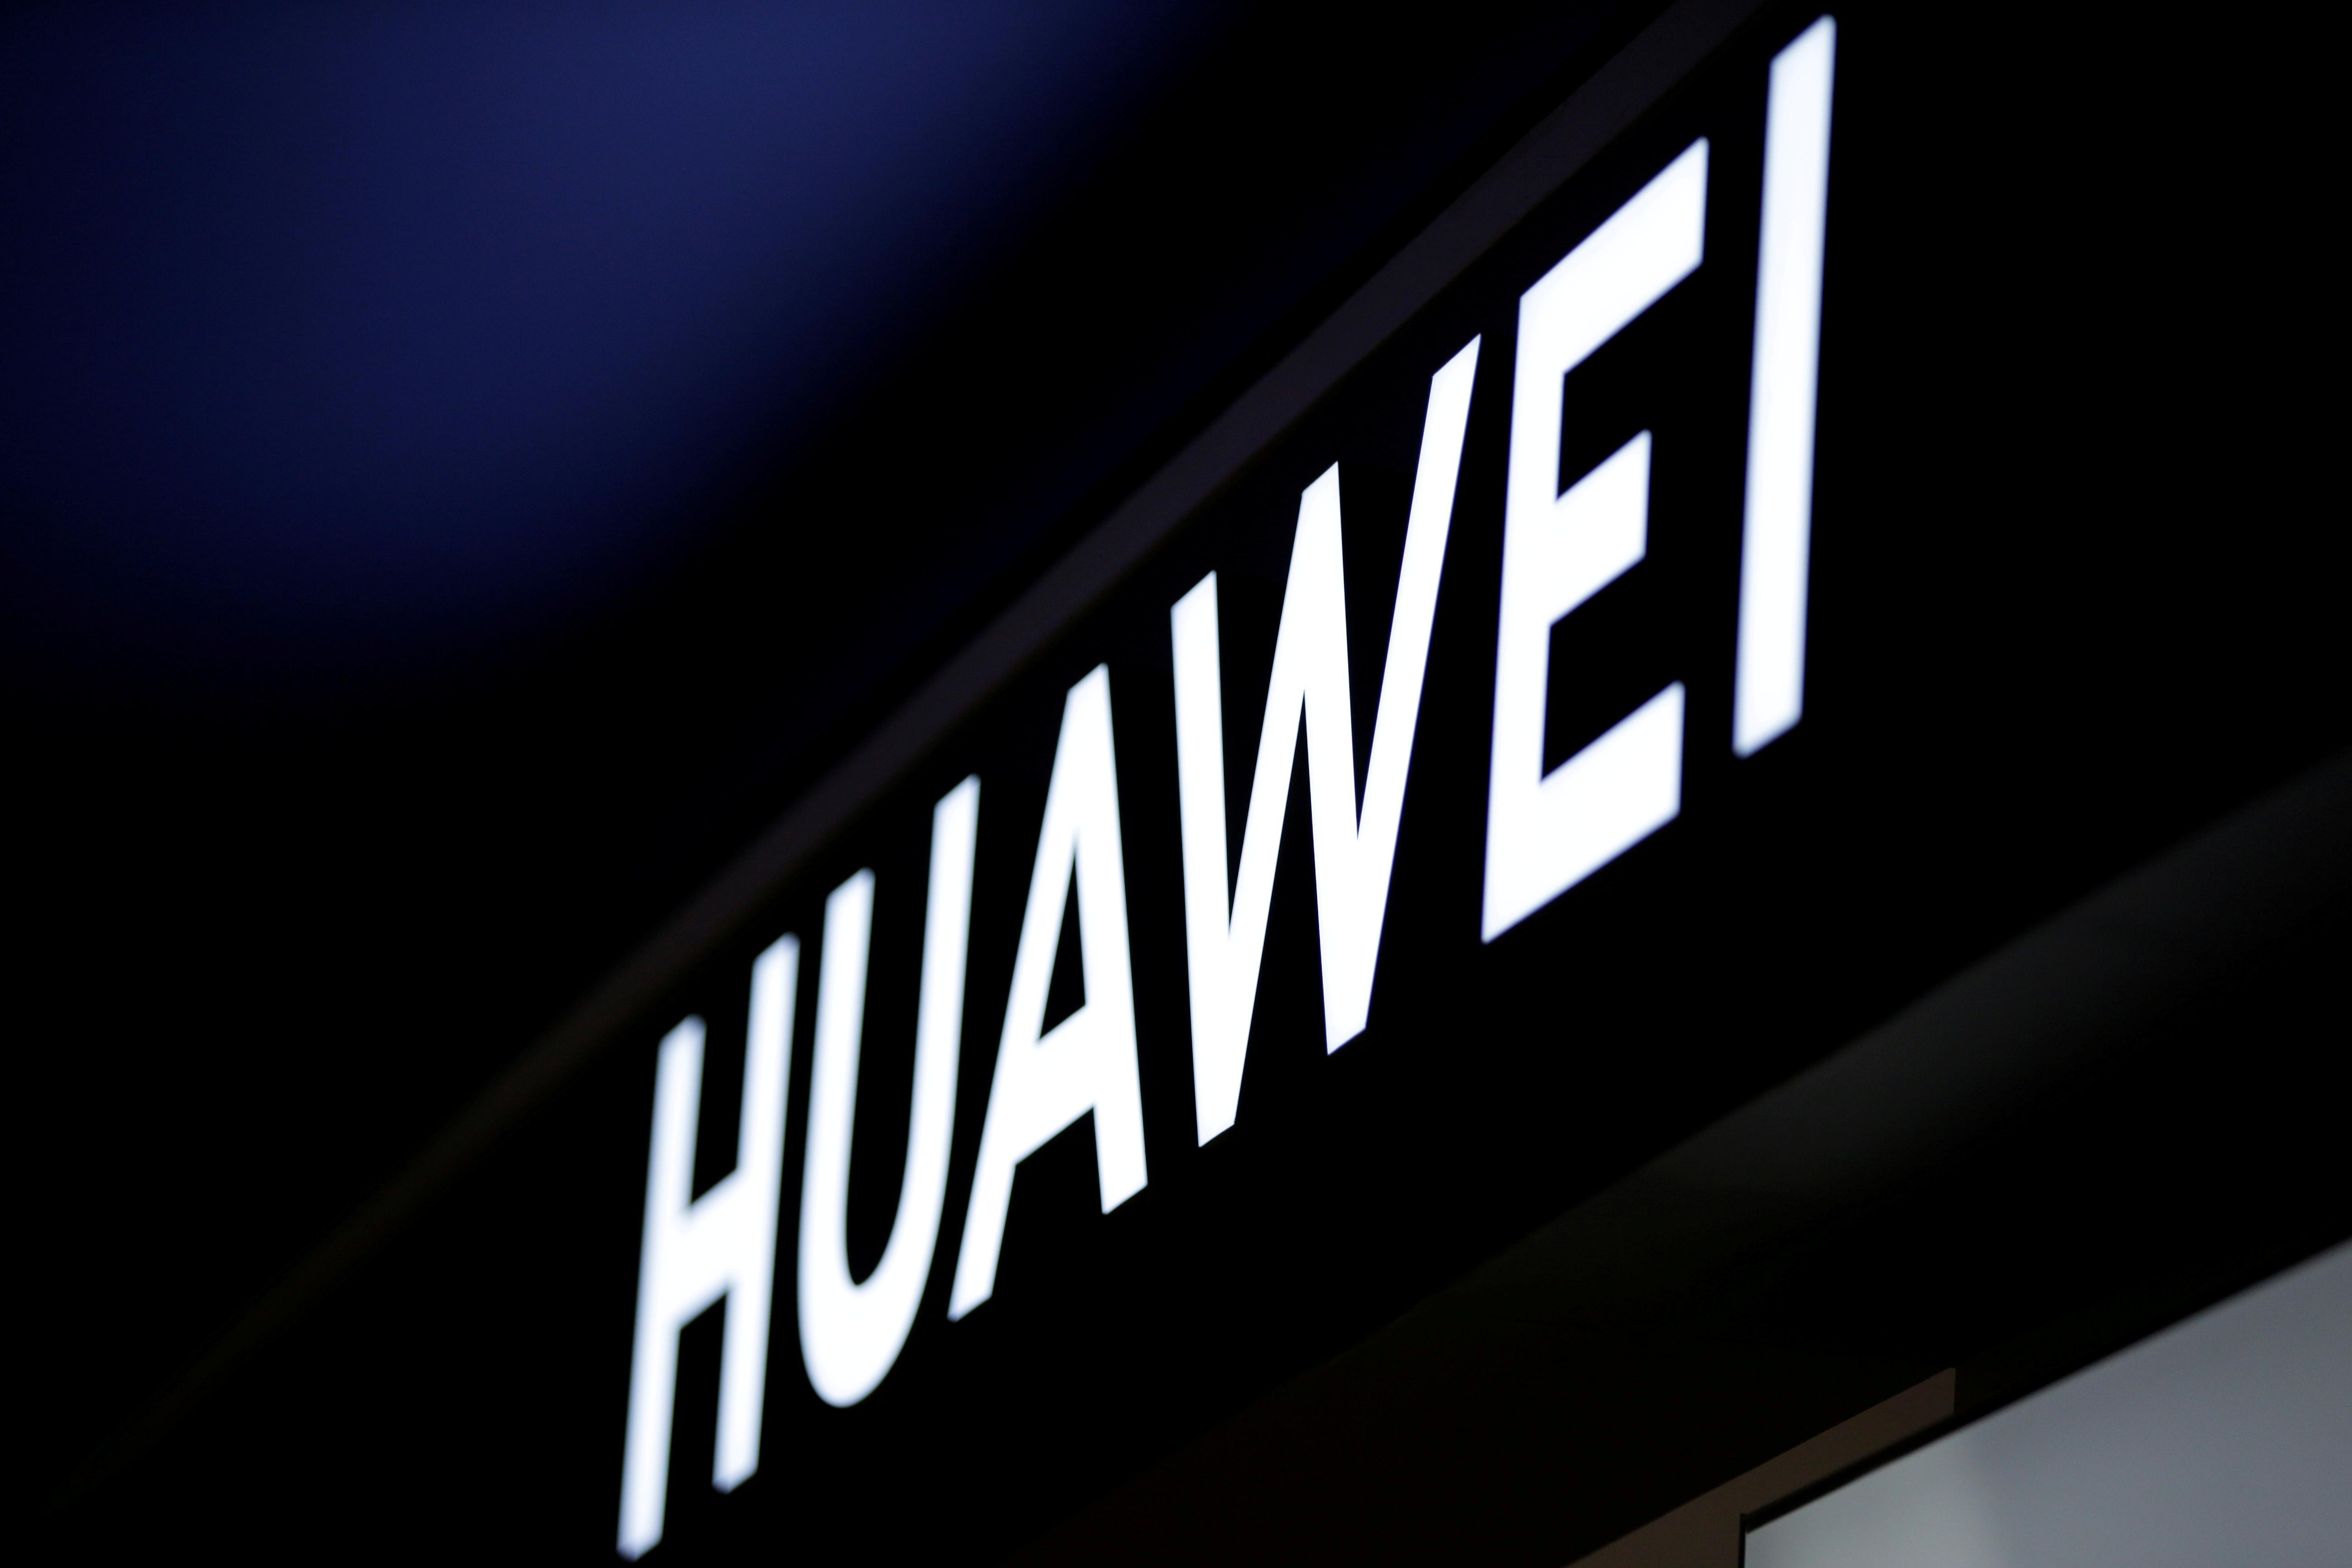 French Senate rejects tougher telecoms controls despite U.S. Huawei...